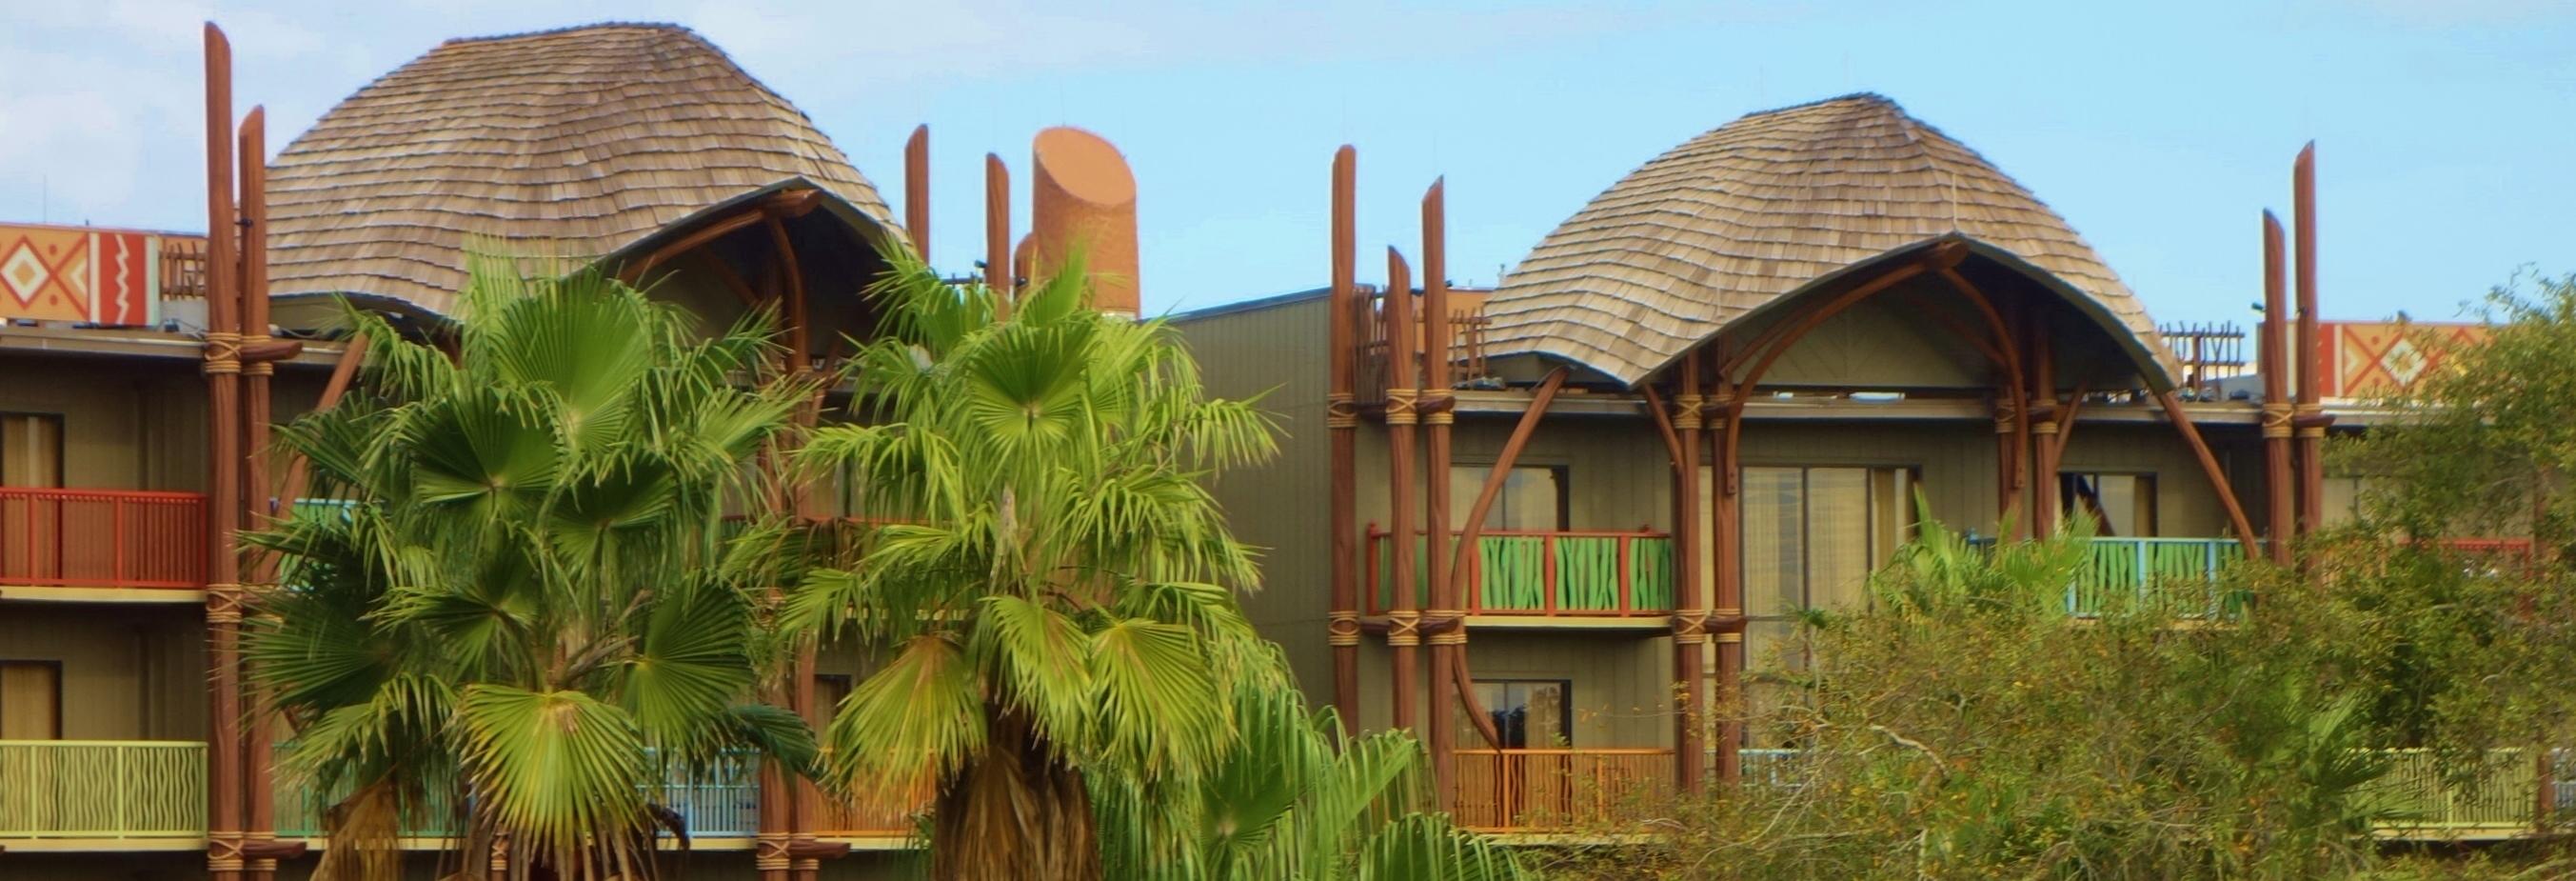 Review: Kidani Village At Disney's Animal Kingdom Villas